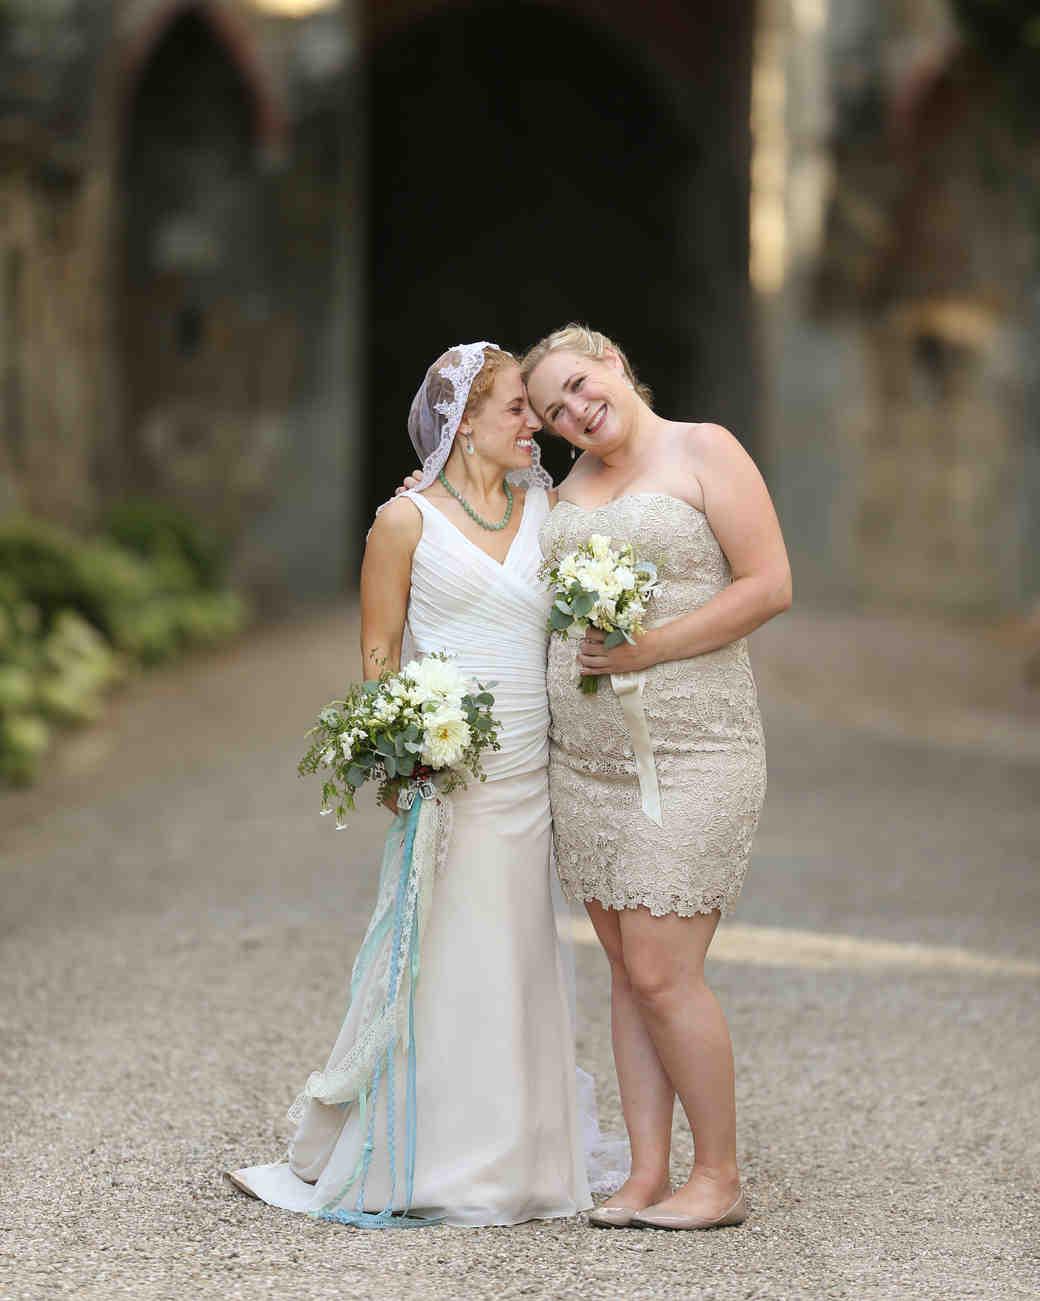 lindsay-andy-wedding-bridesmaid-6163-s111659-1114.jpg